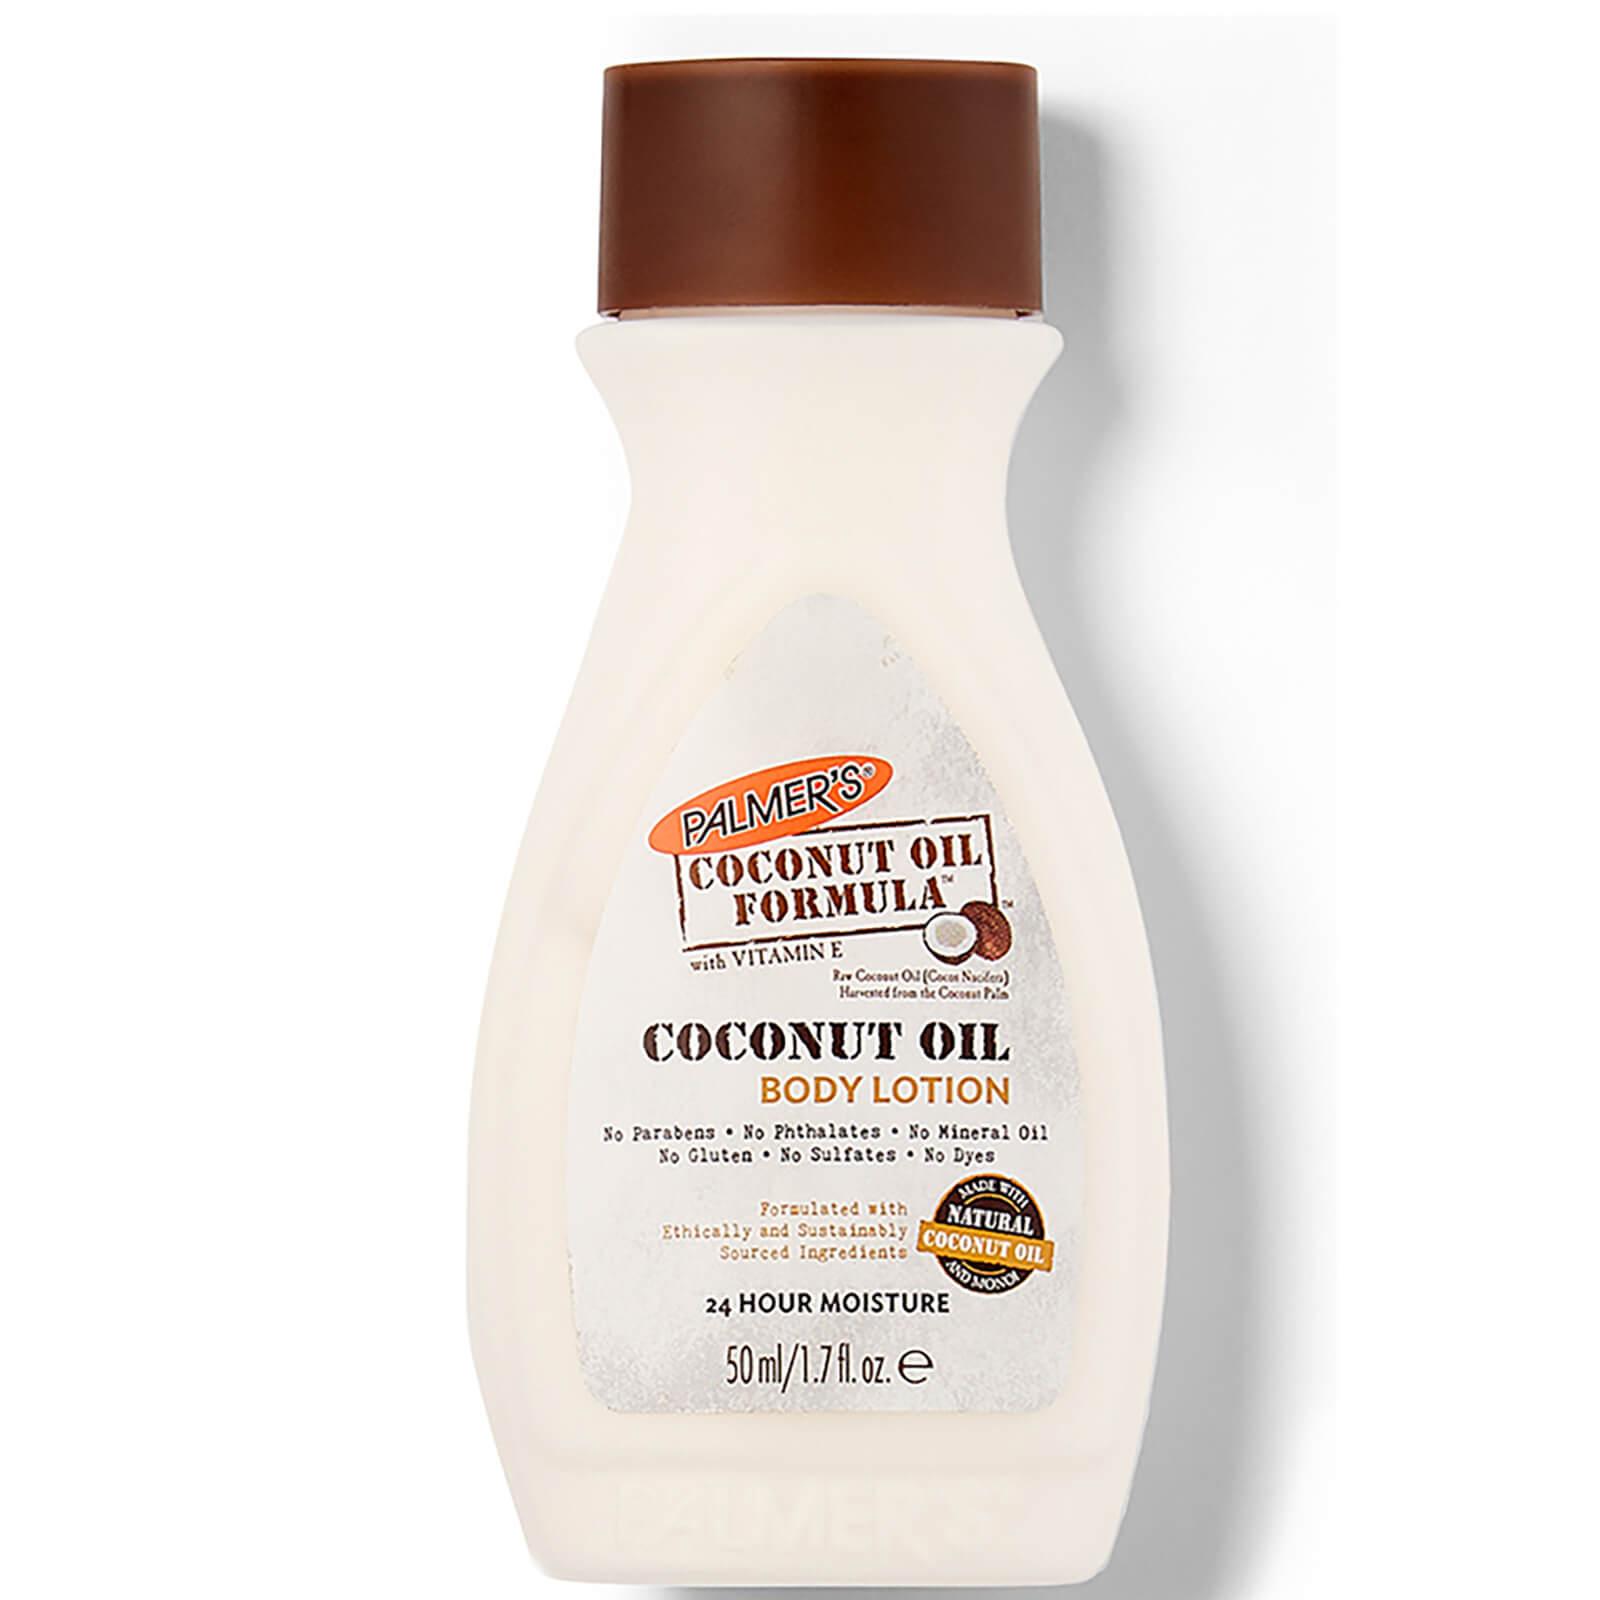 Palmer's Coconut Oil Formula Body Lotion - 50ml